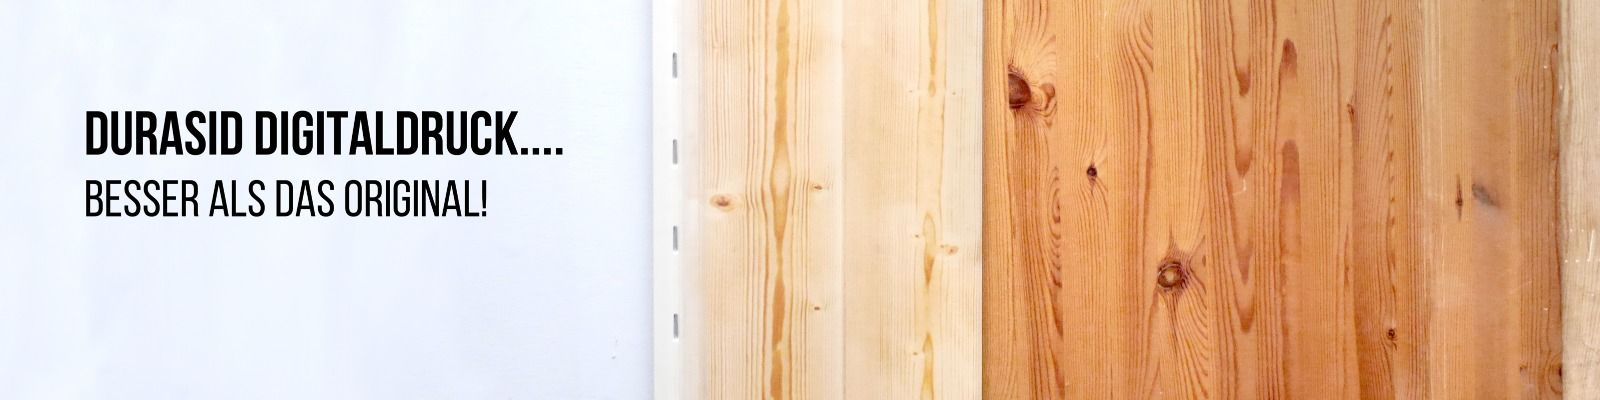 Fassadenverkleidung Kunststoff